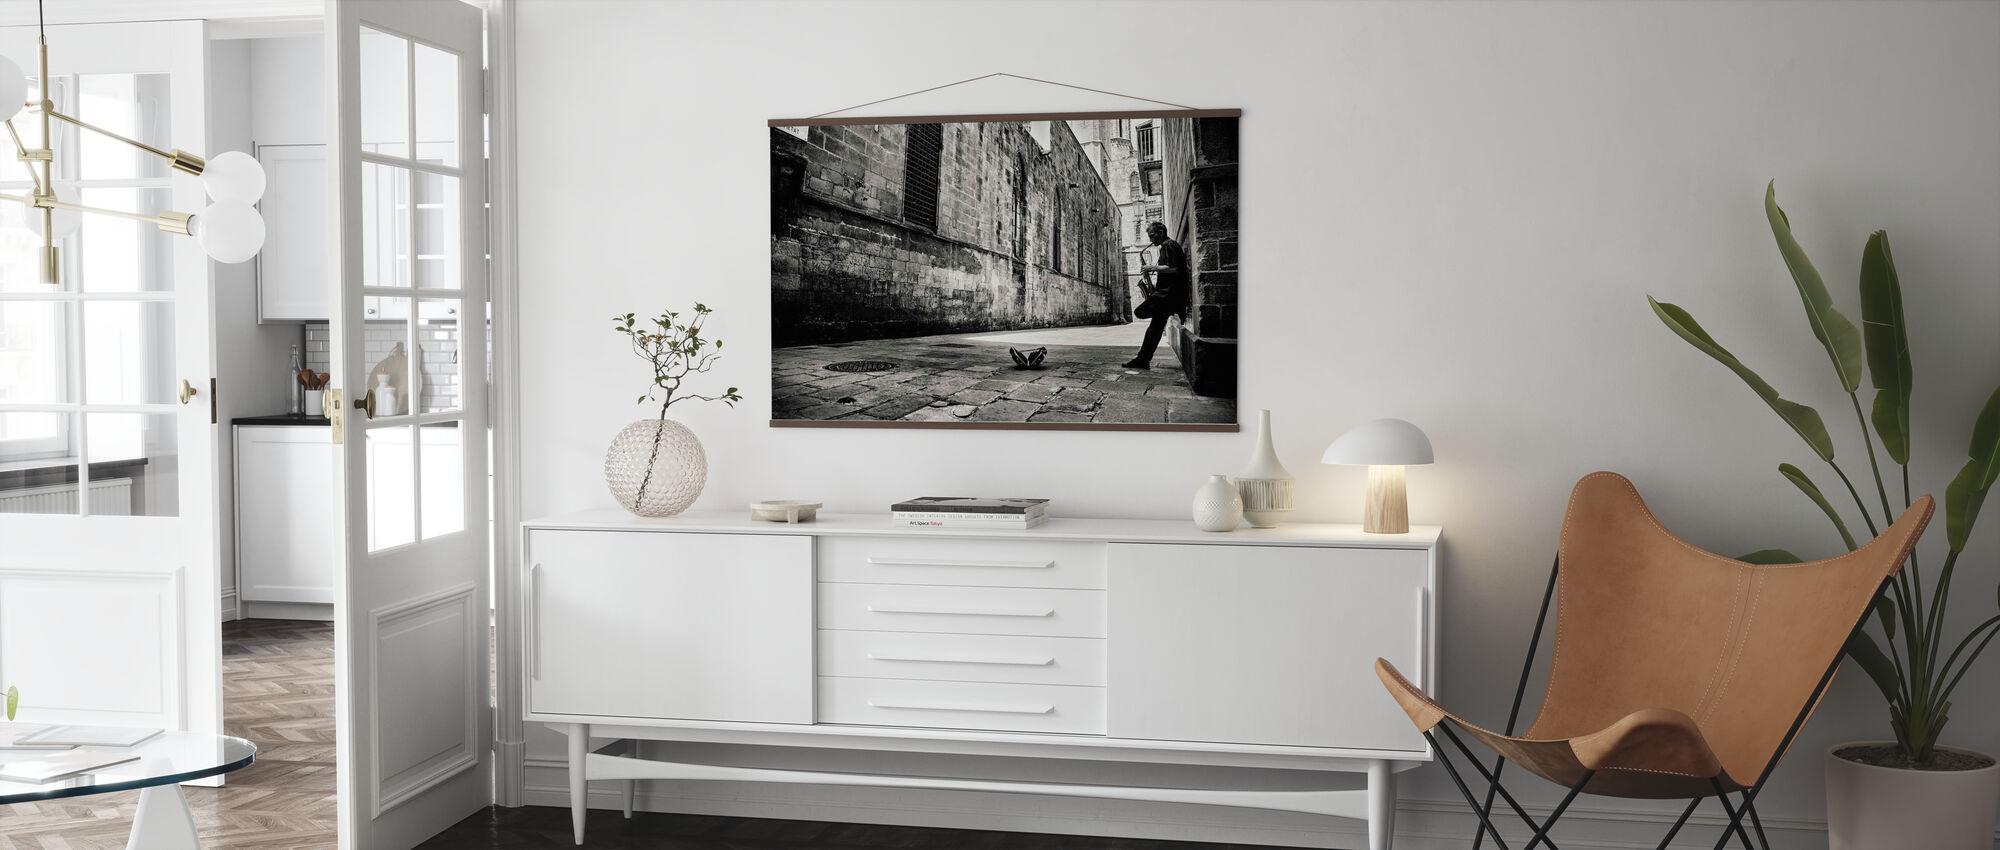 Silent Street, black and white - Poster - Living Room